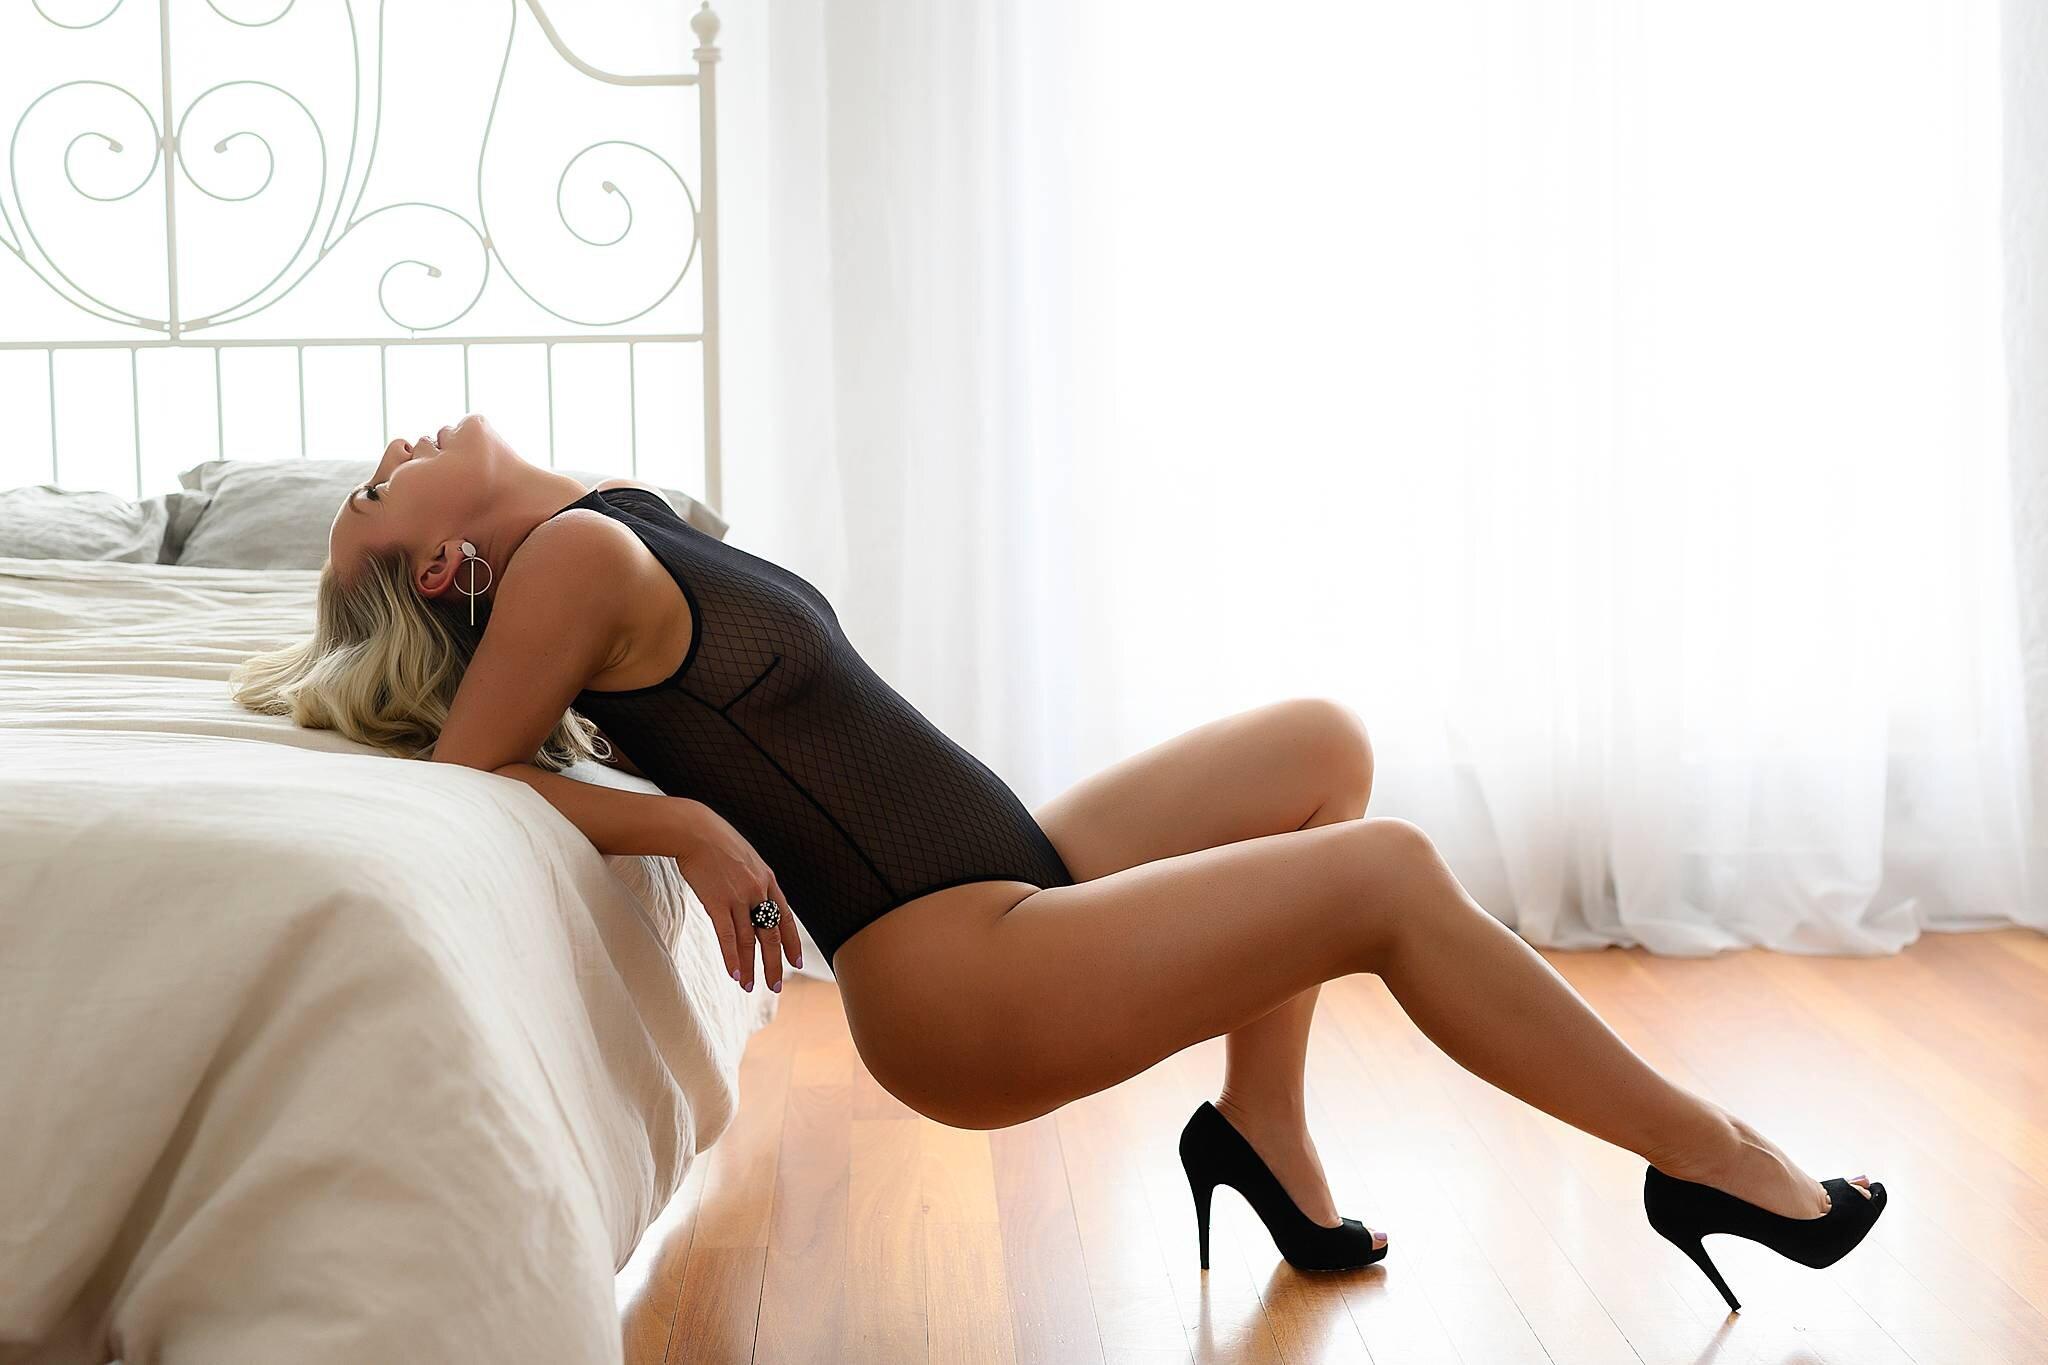 Boudoir lingerie photography